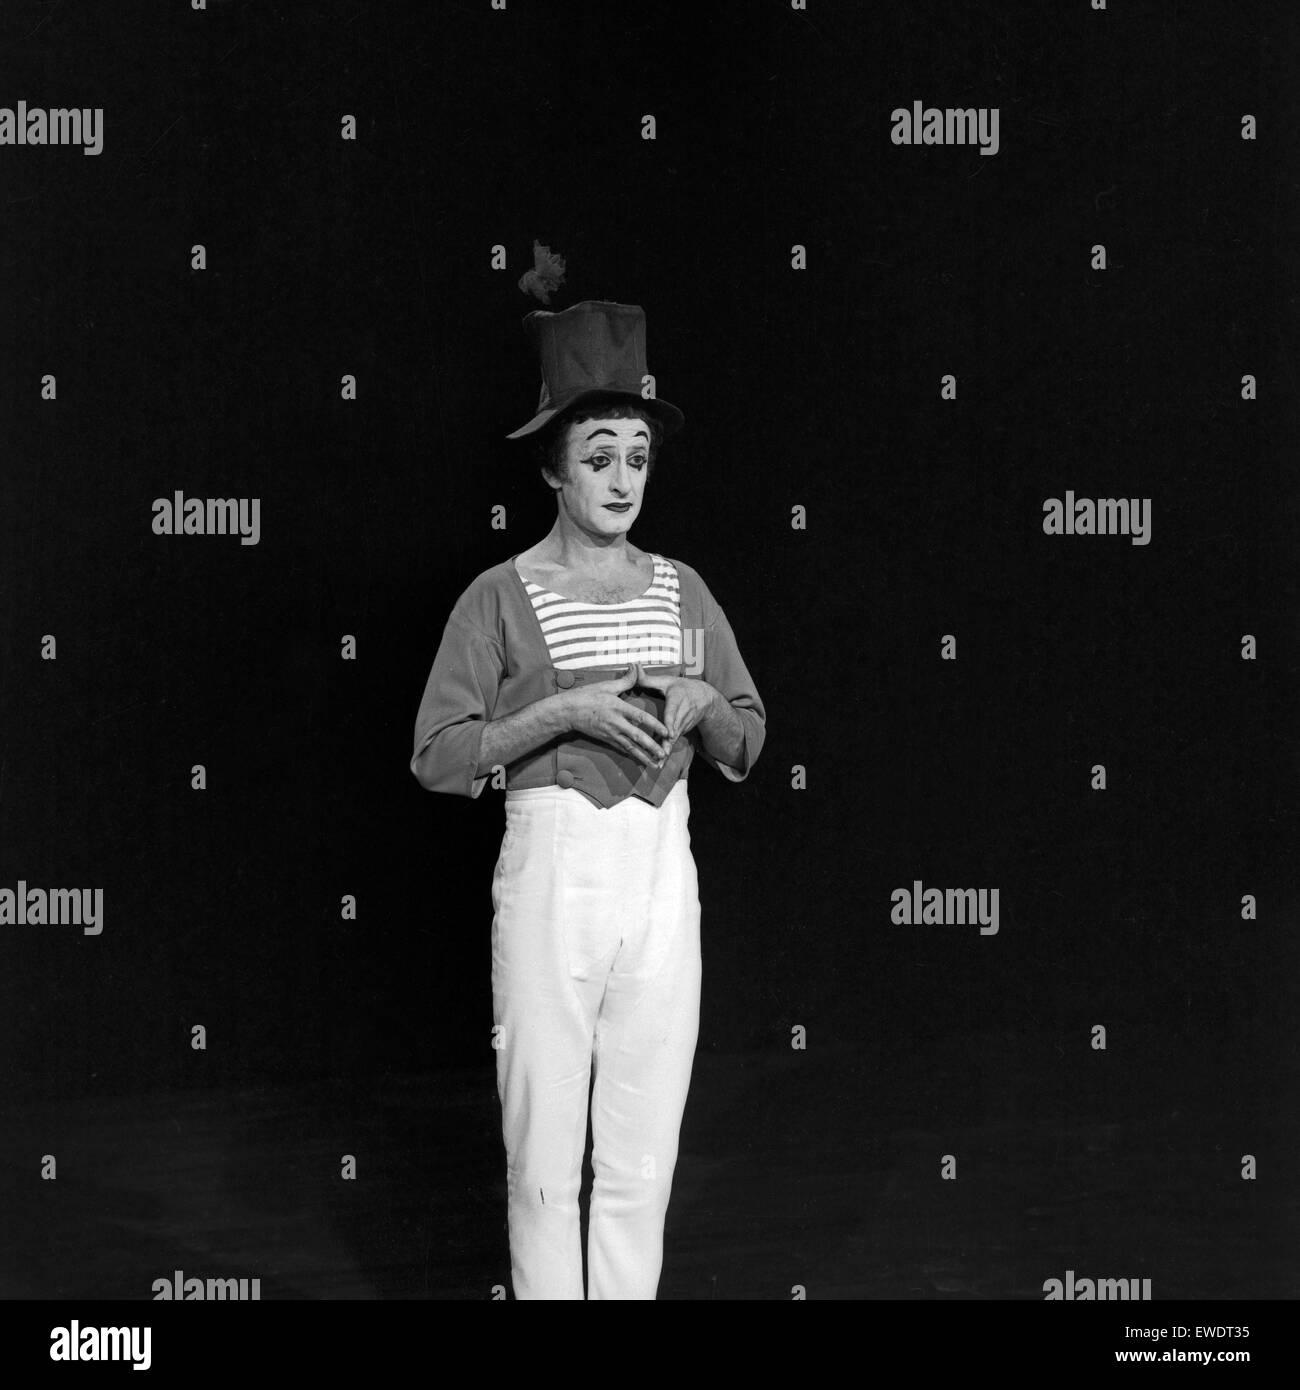 Französischer Pantomime Marcel Marceau in Hamburg, Deutschland 1960er Jahre. French pantomime Marcel Marceau - Stock Image